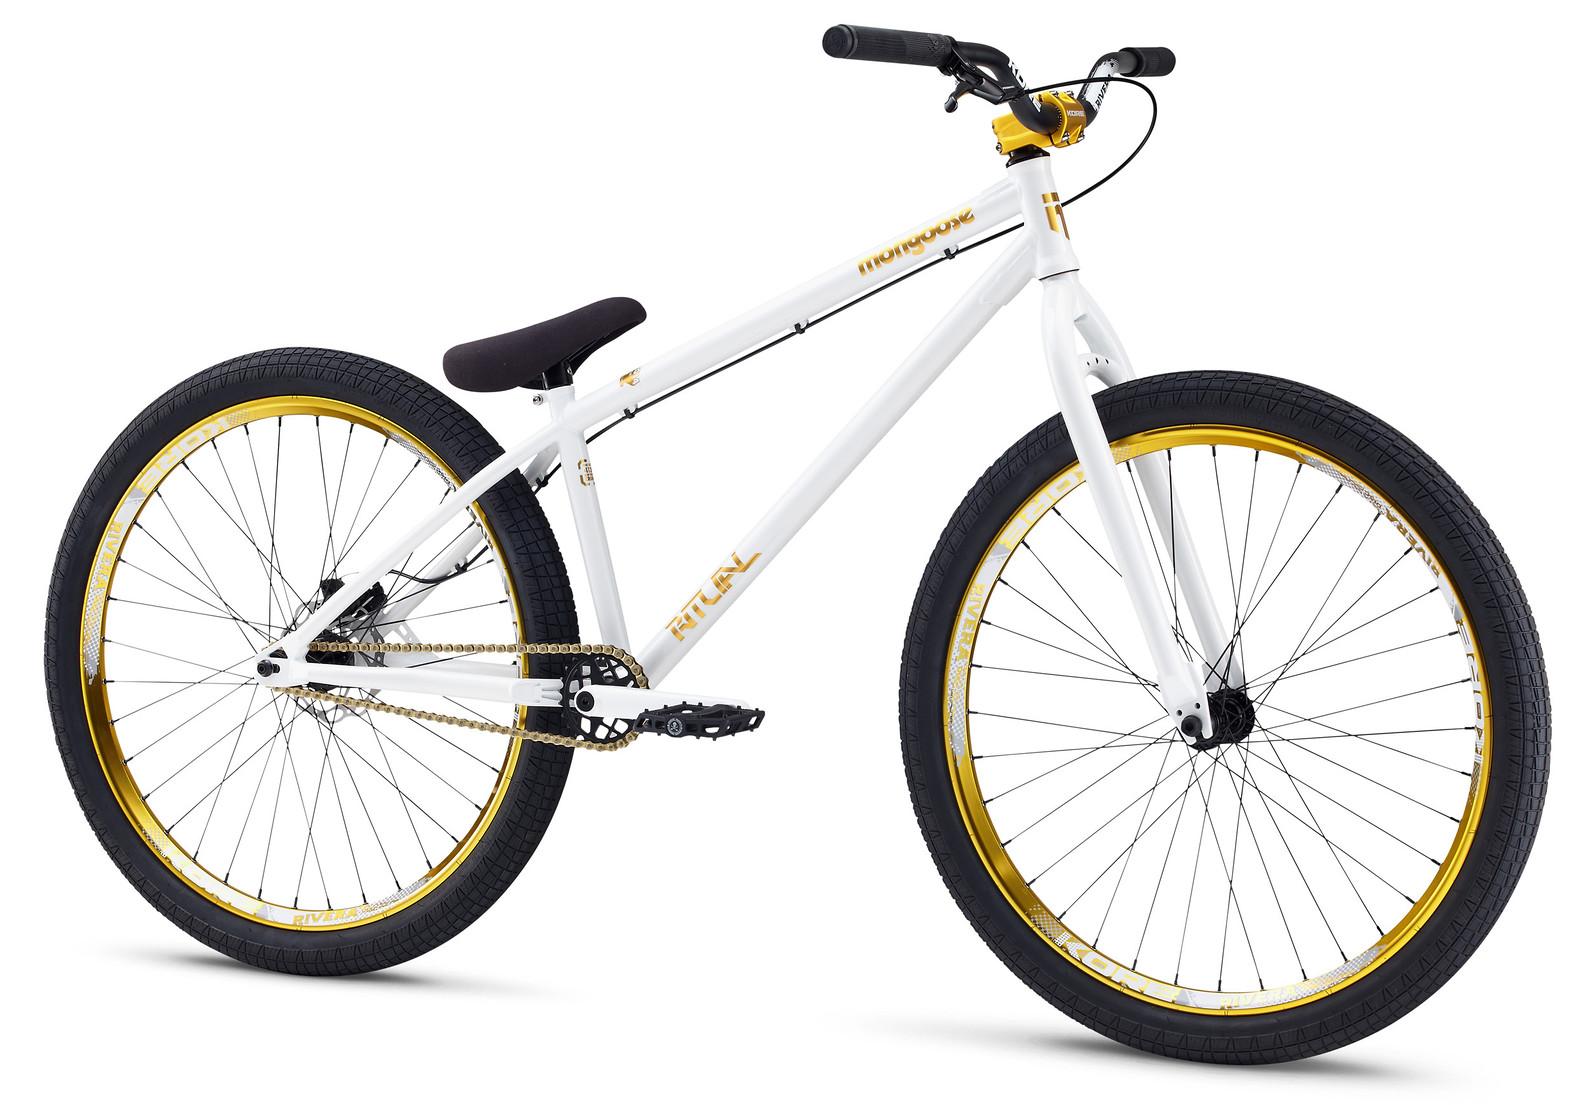 Bike - 2014 Mongoose Ritual Street